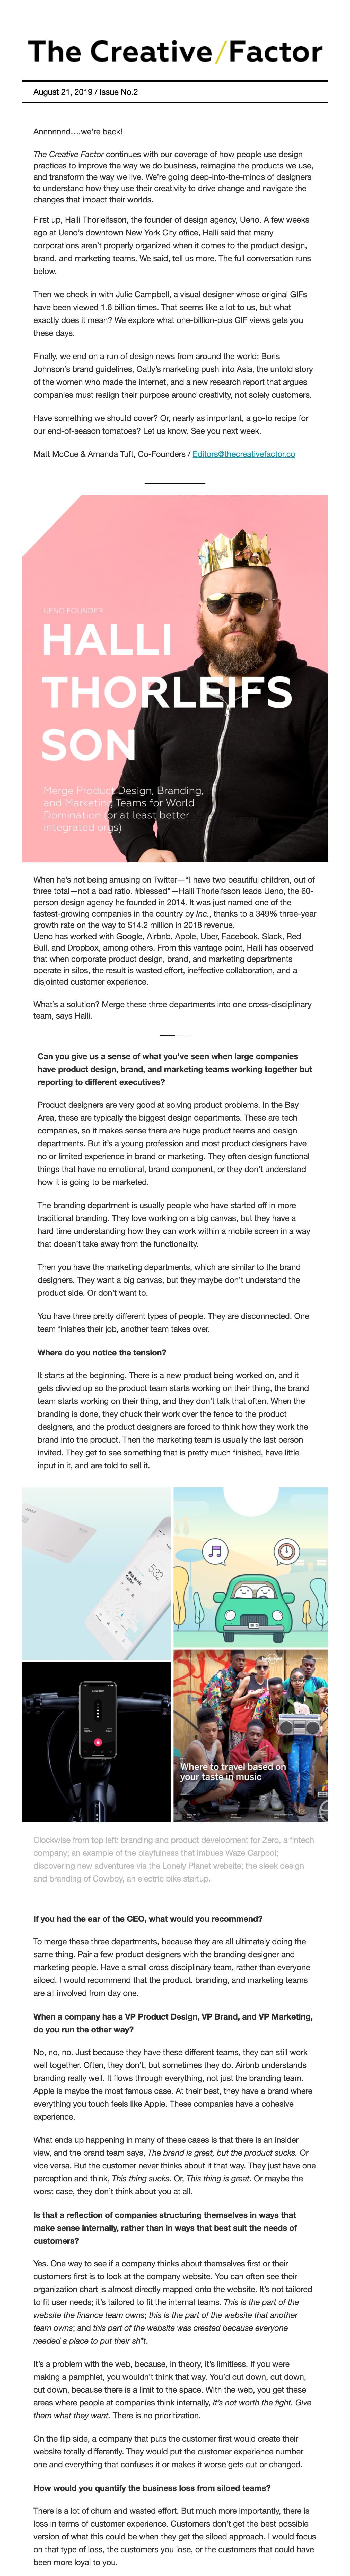 The Creative Factor Email Screenshot